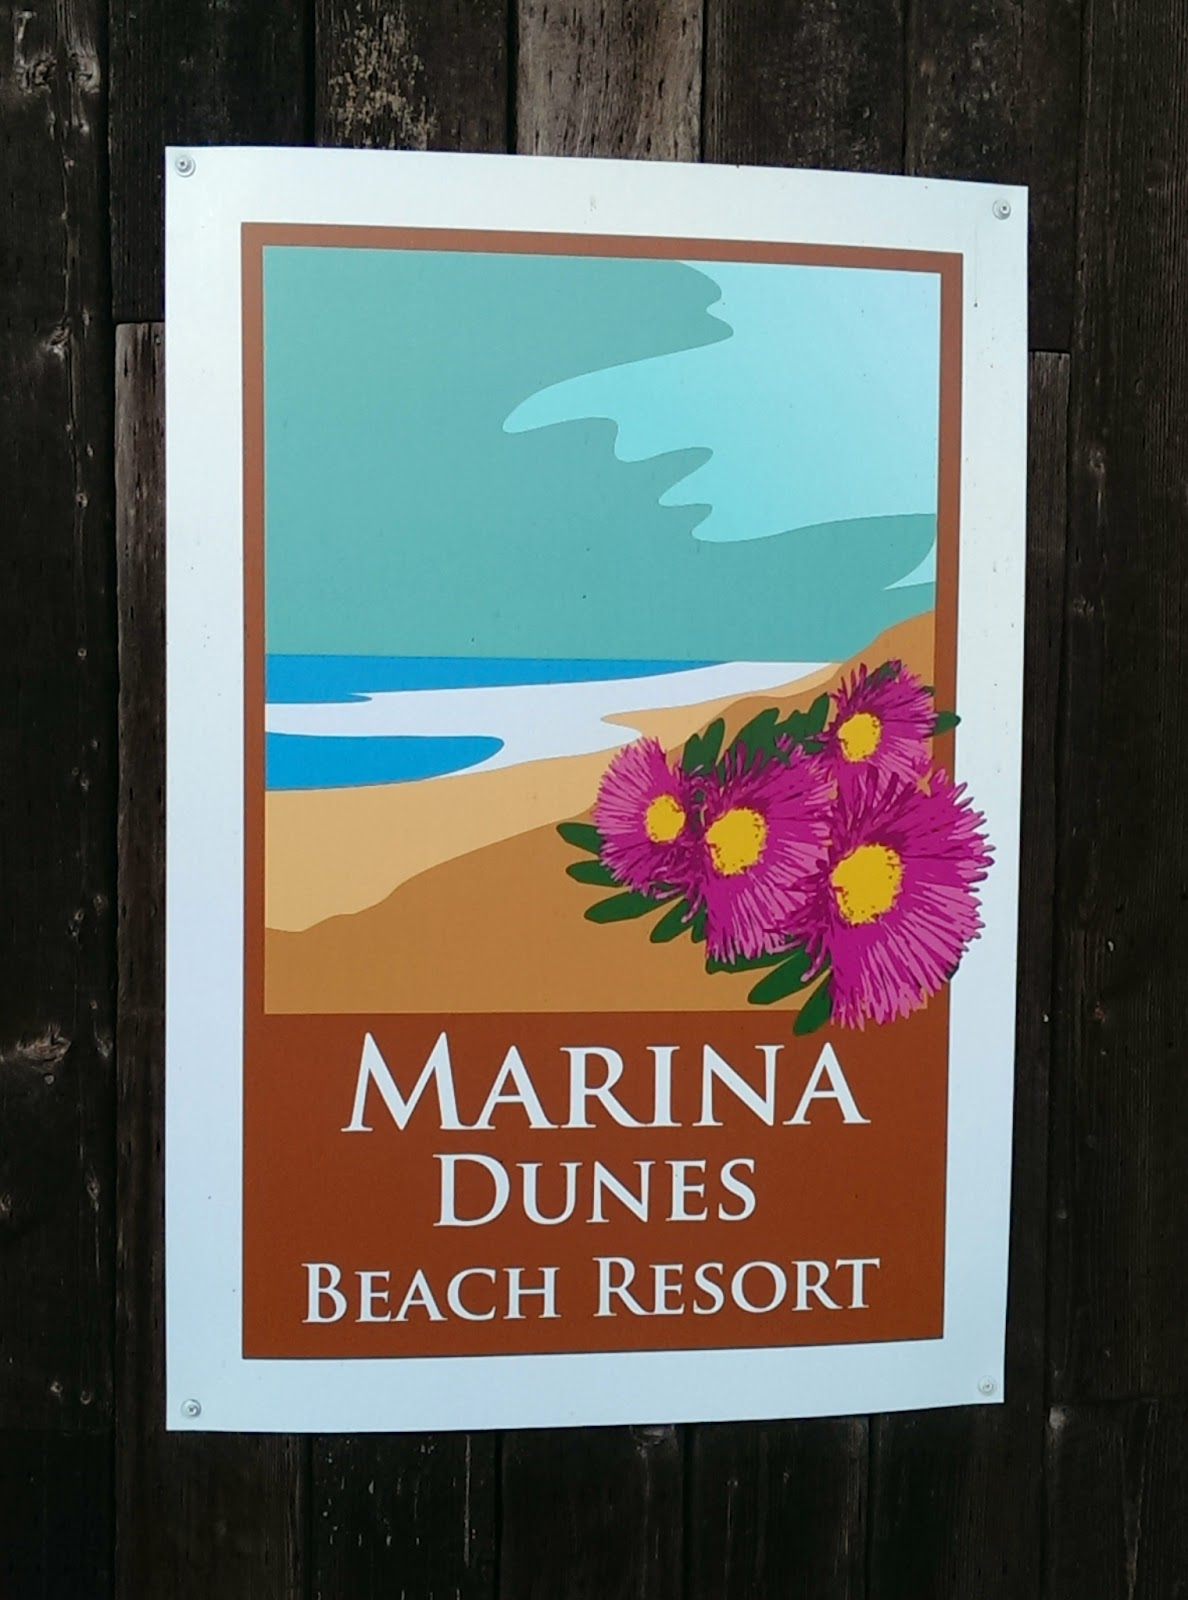 Monterey. Camping, RVing, Rentals